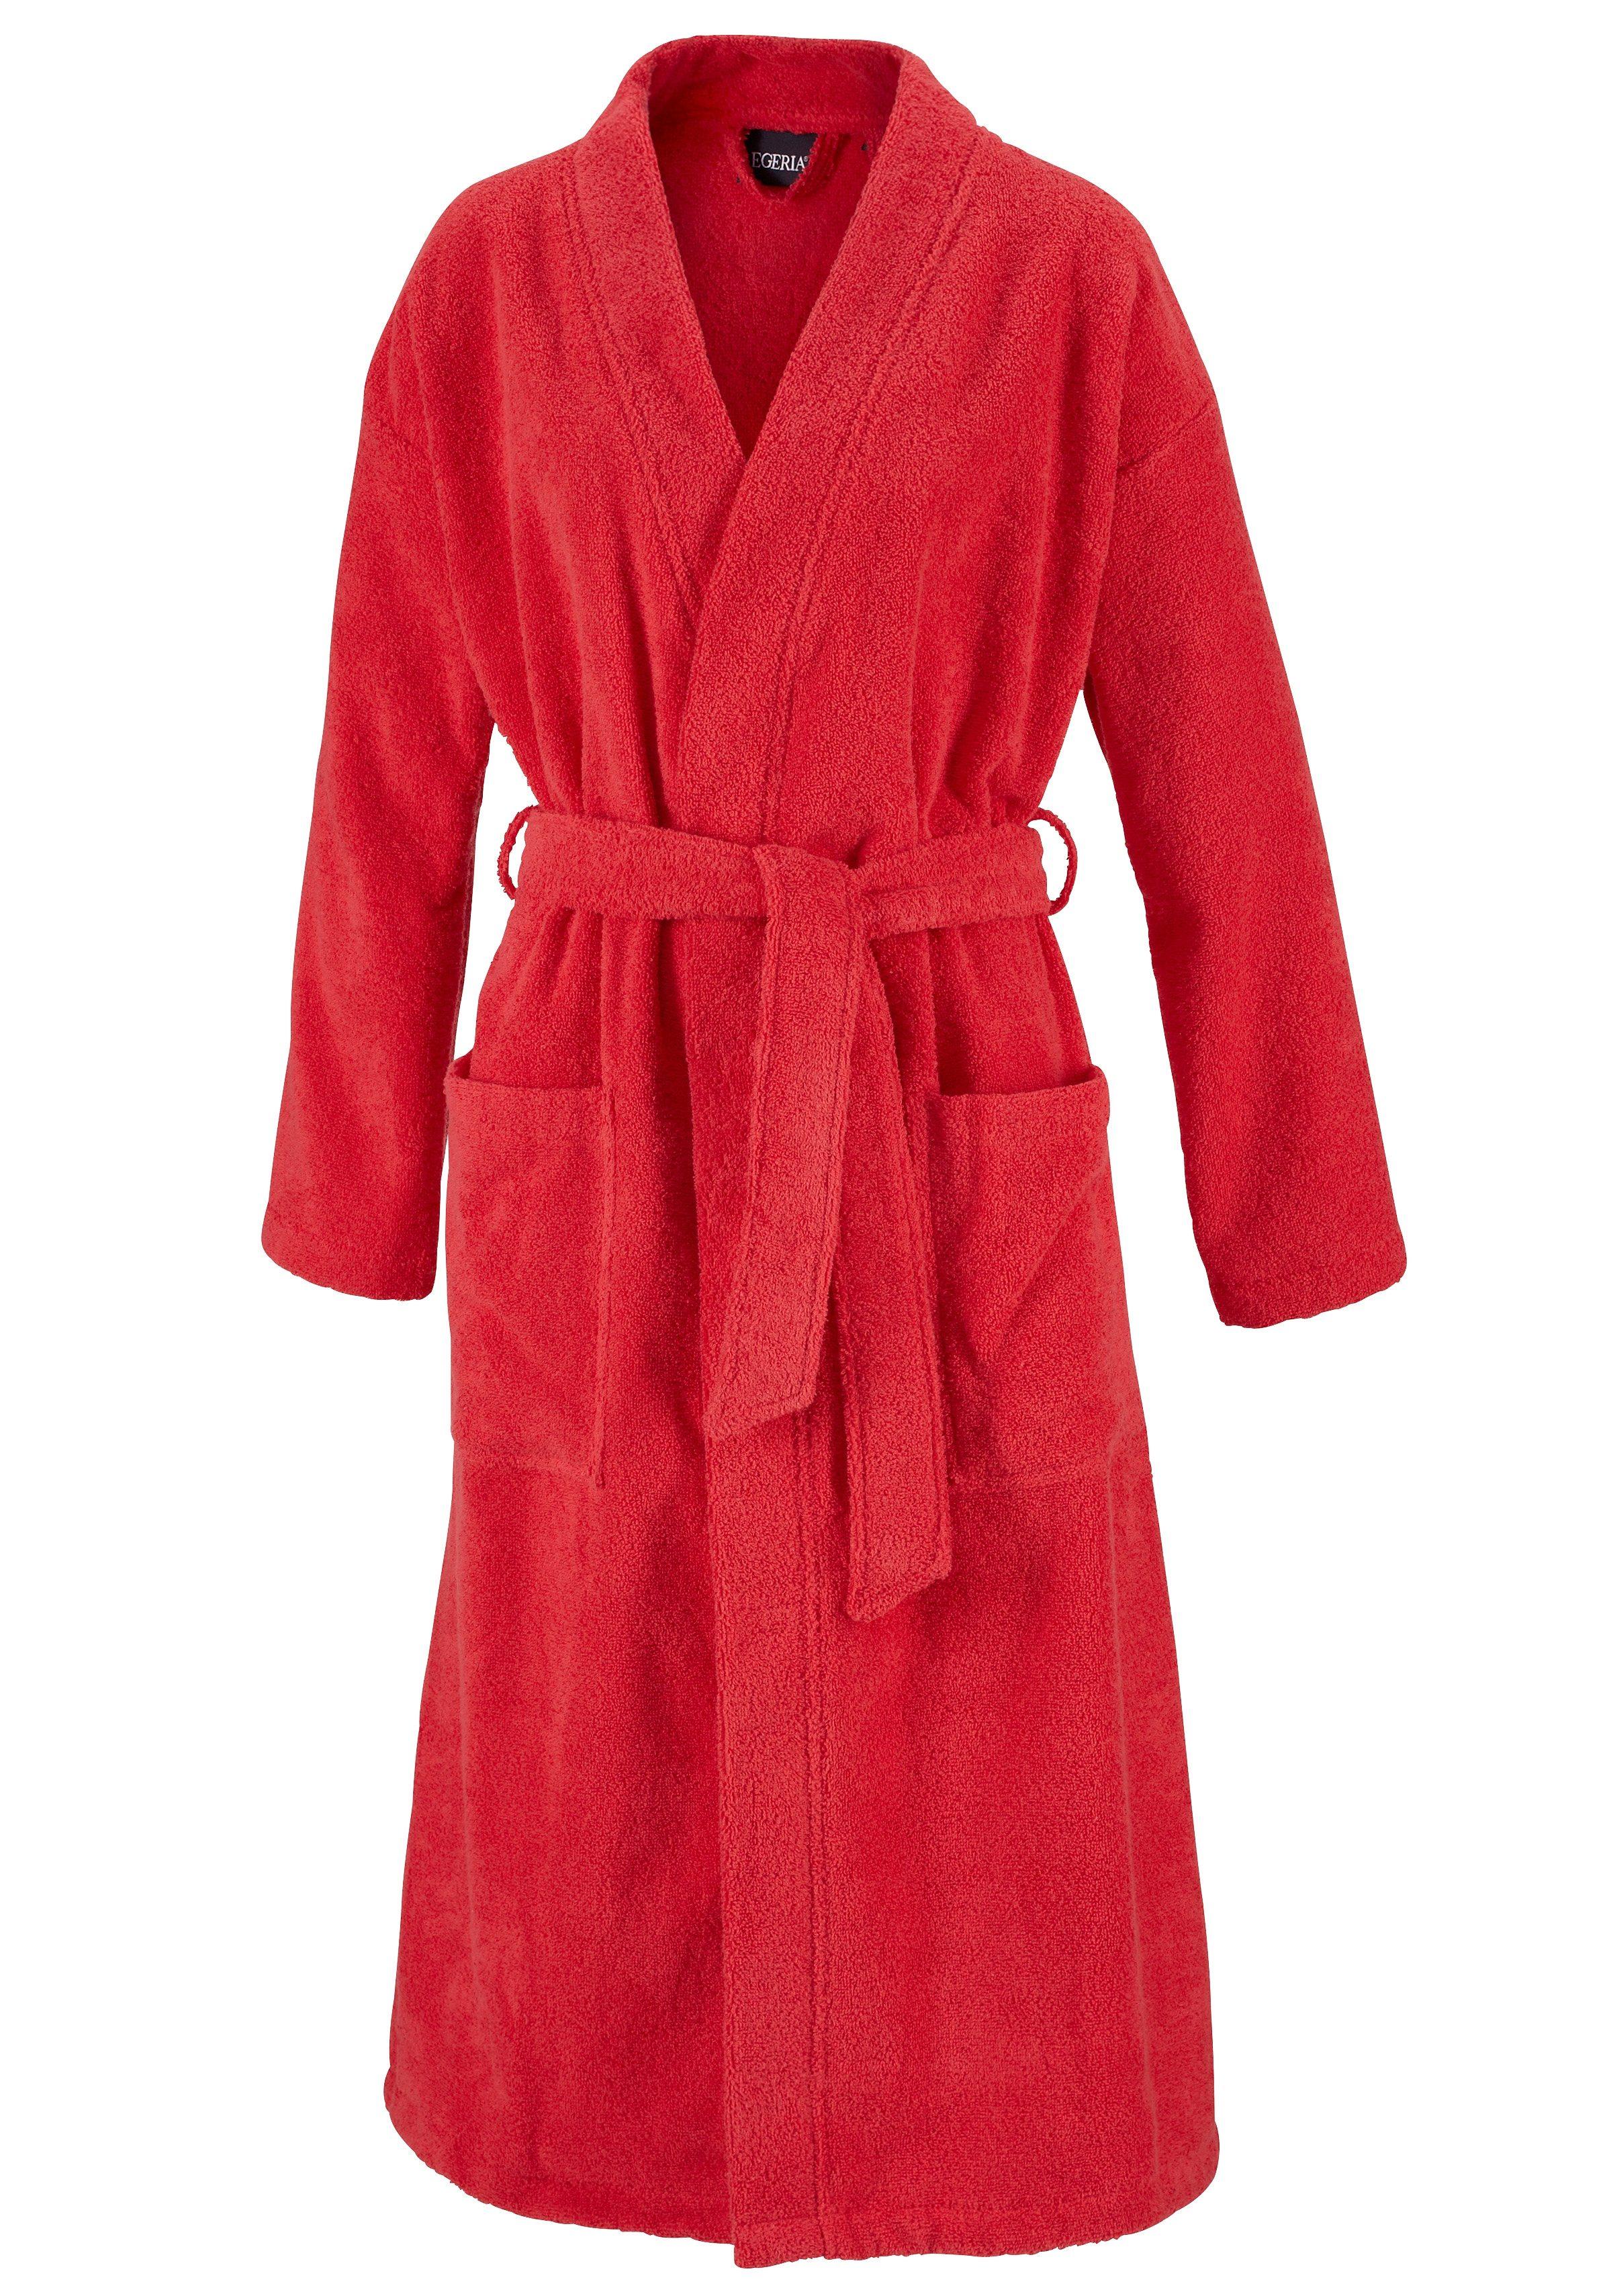 Unisex-Bademantel, Egeria, »Topas«, in Kimonoform   Bekleidung > Bademode > Bademäntel   Rot   Baumwolle   EGERIA